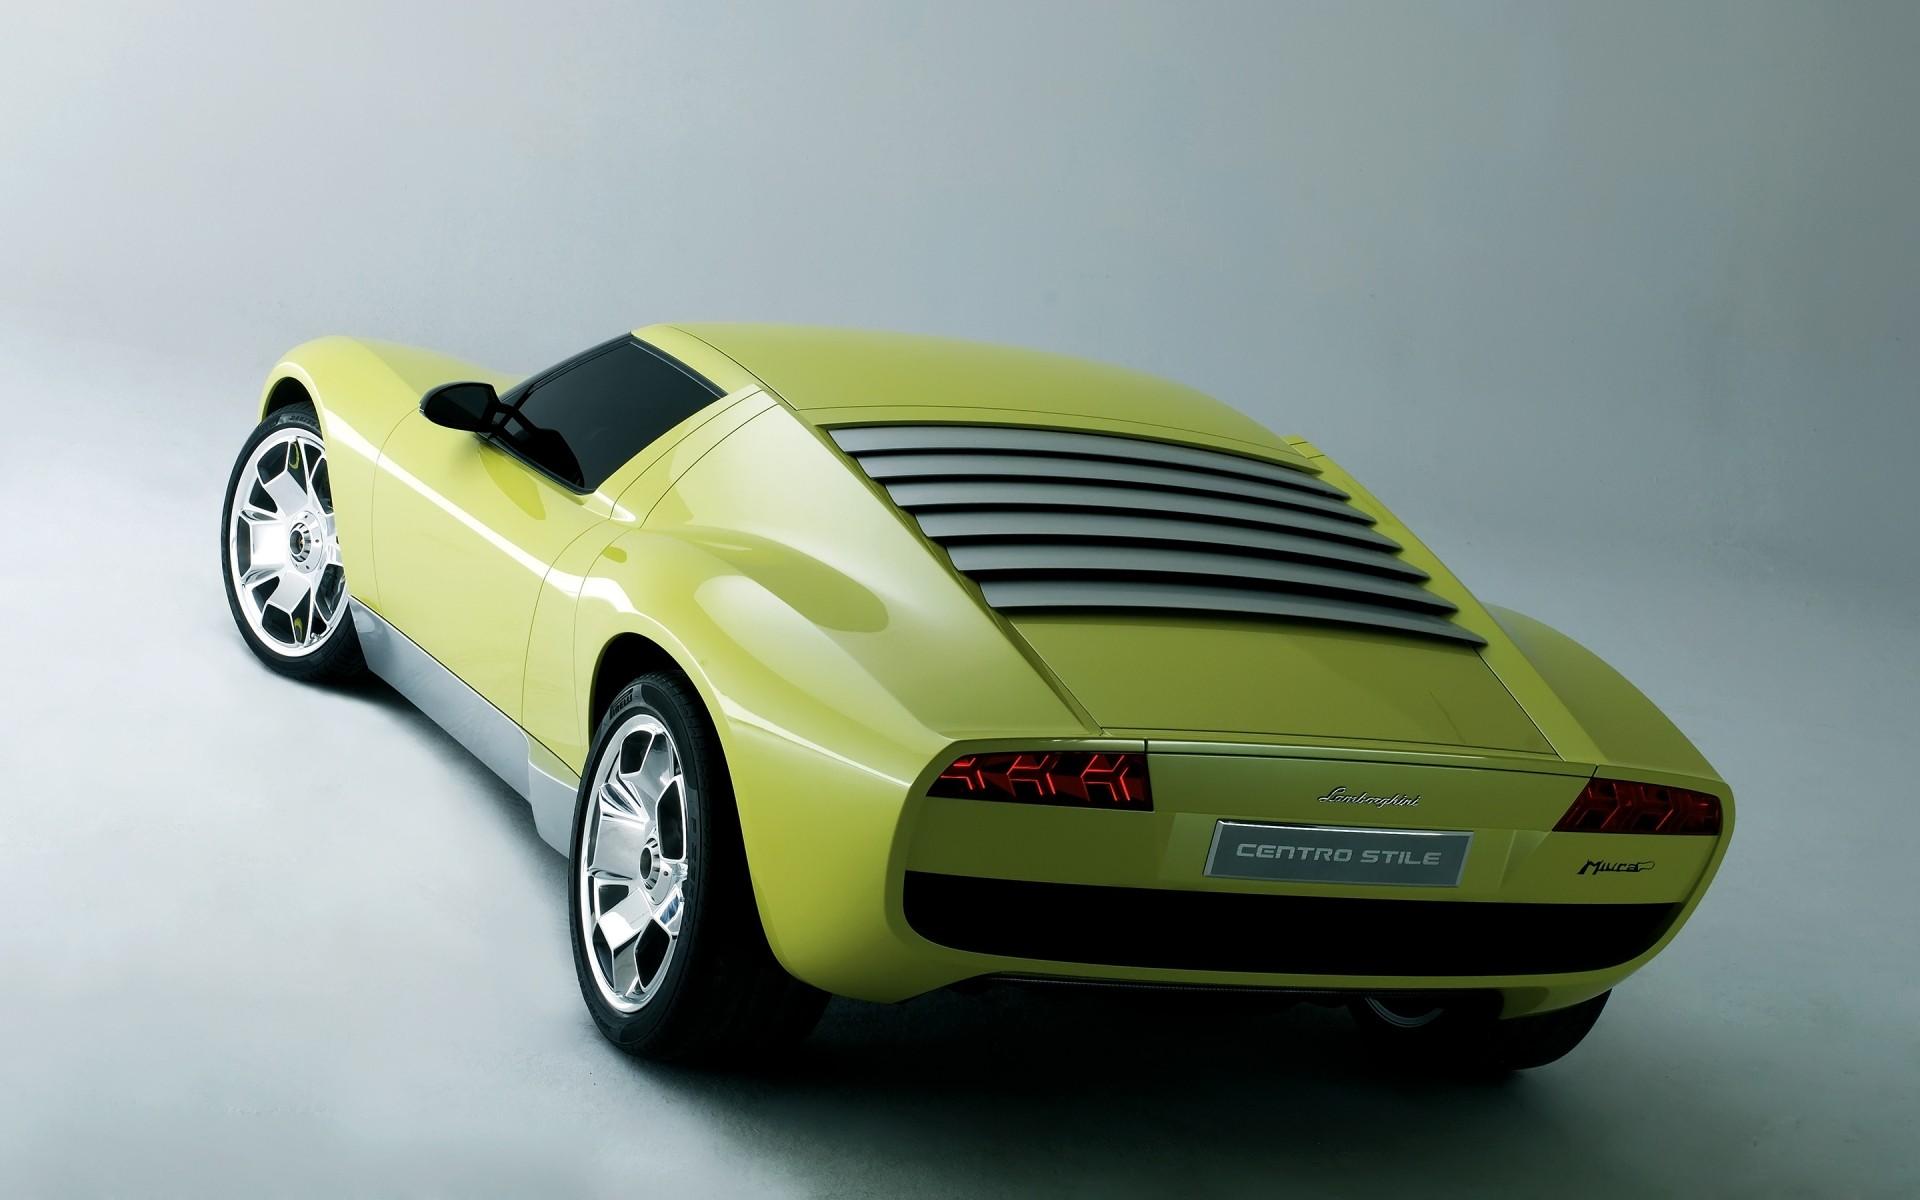 Lamborghini Miura Concept Rear Iphone Wallpapers For Free